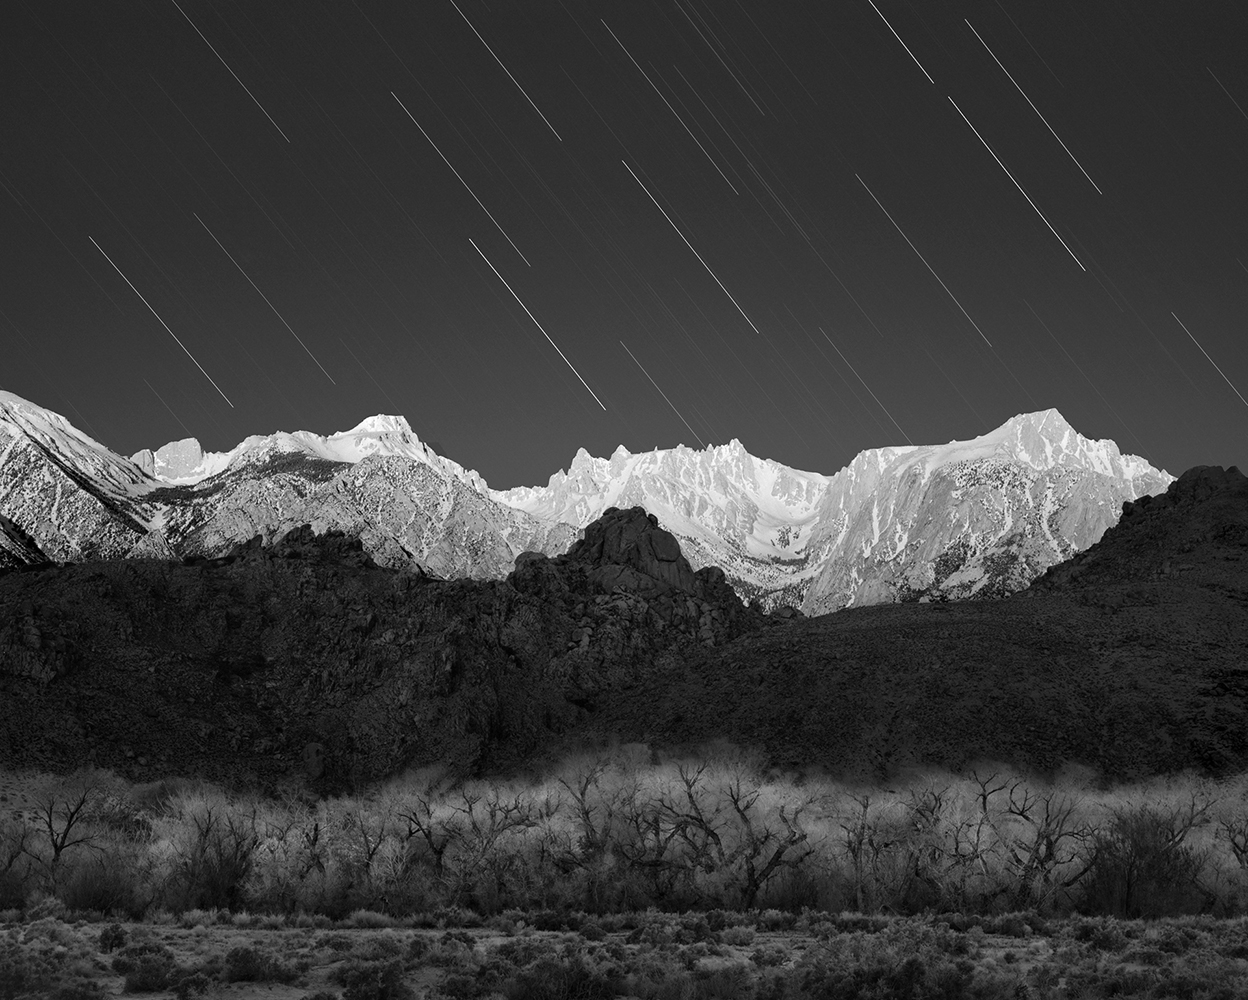 image © Brian Kosoff